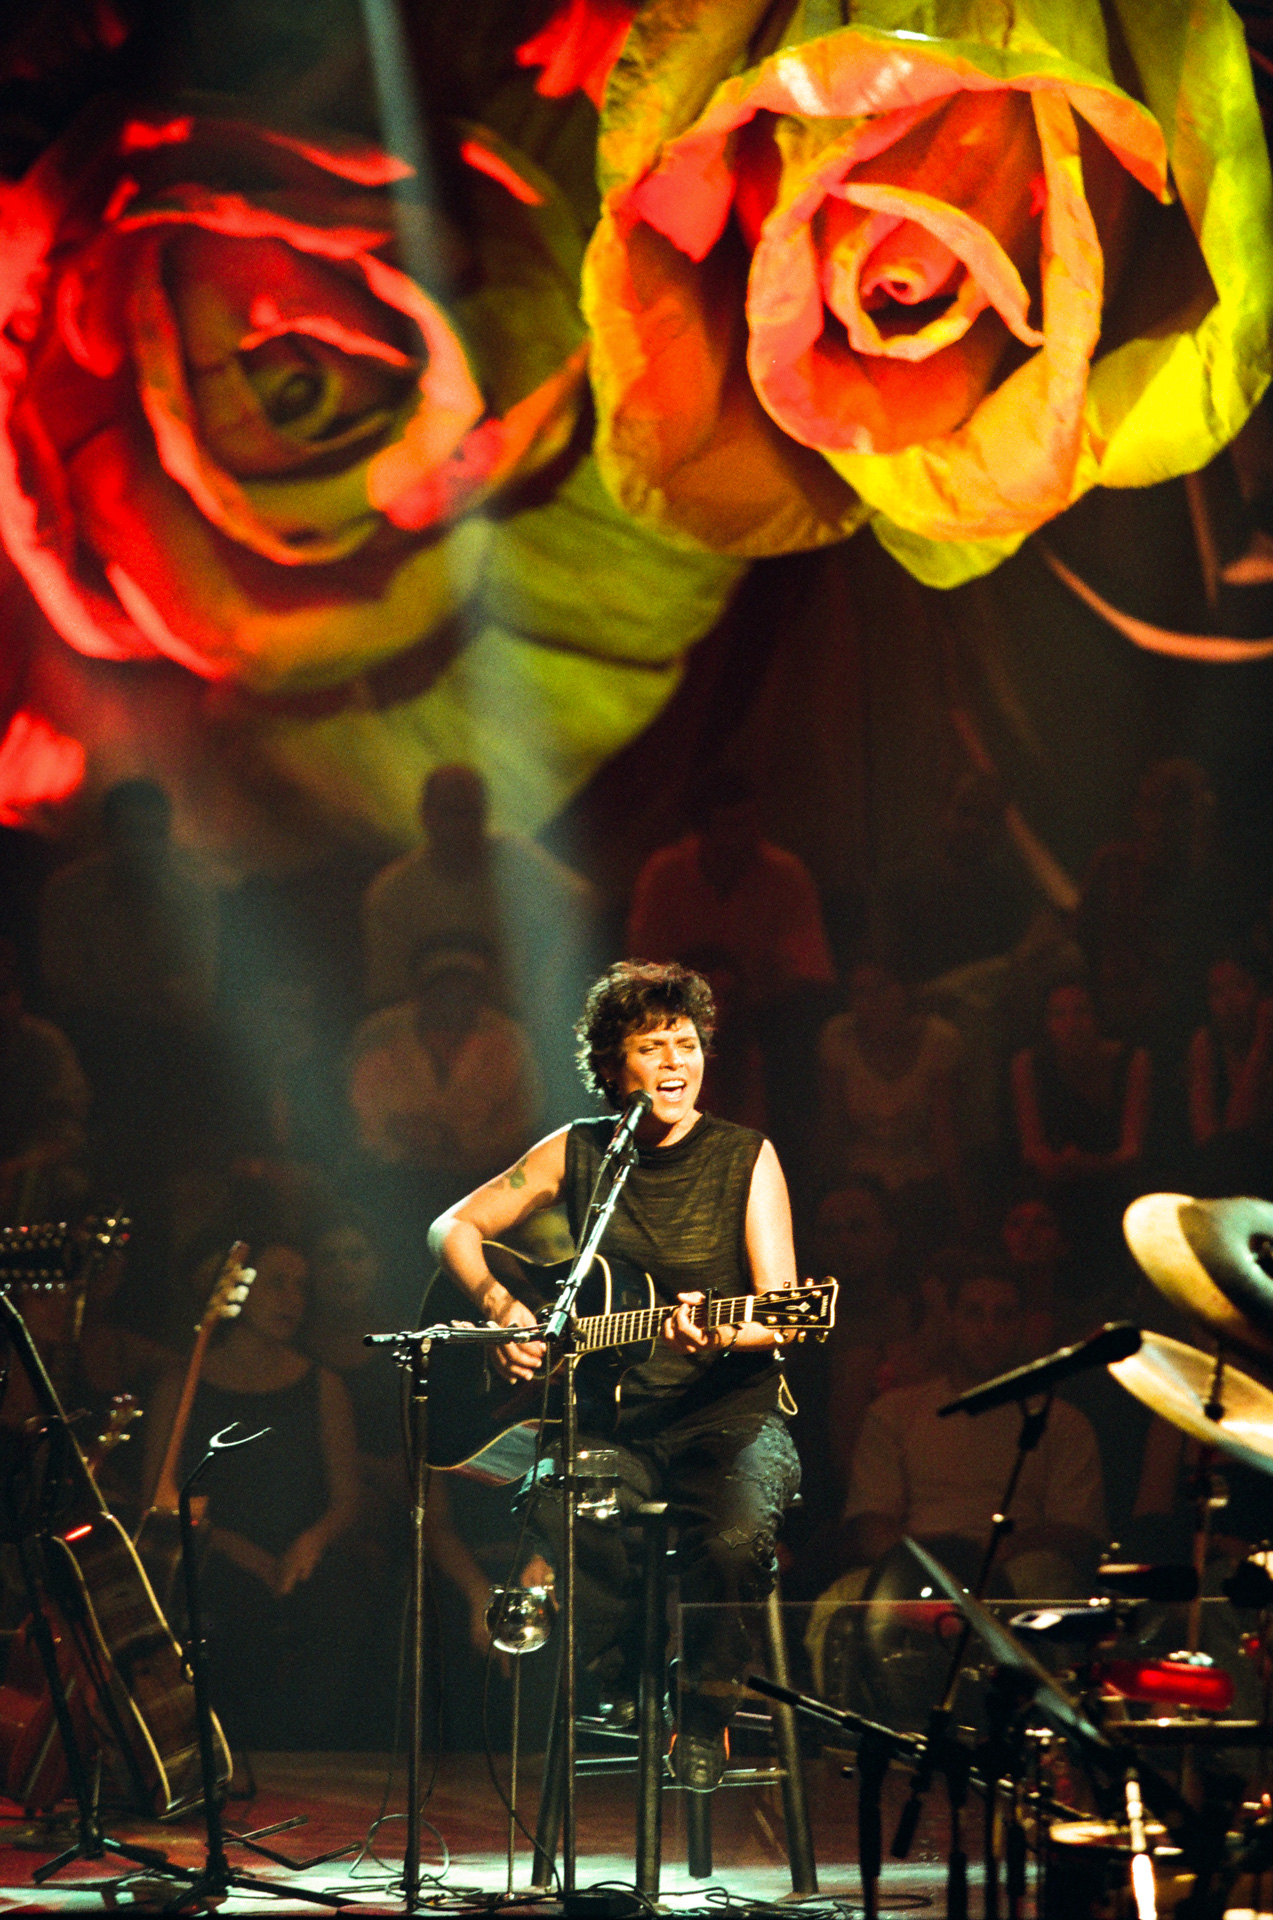 Cássia Eller _ Unplugged MTV cover